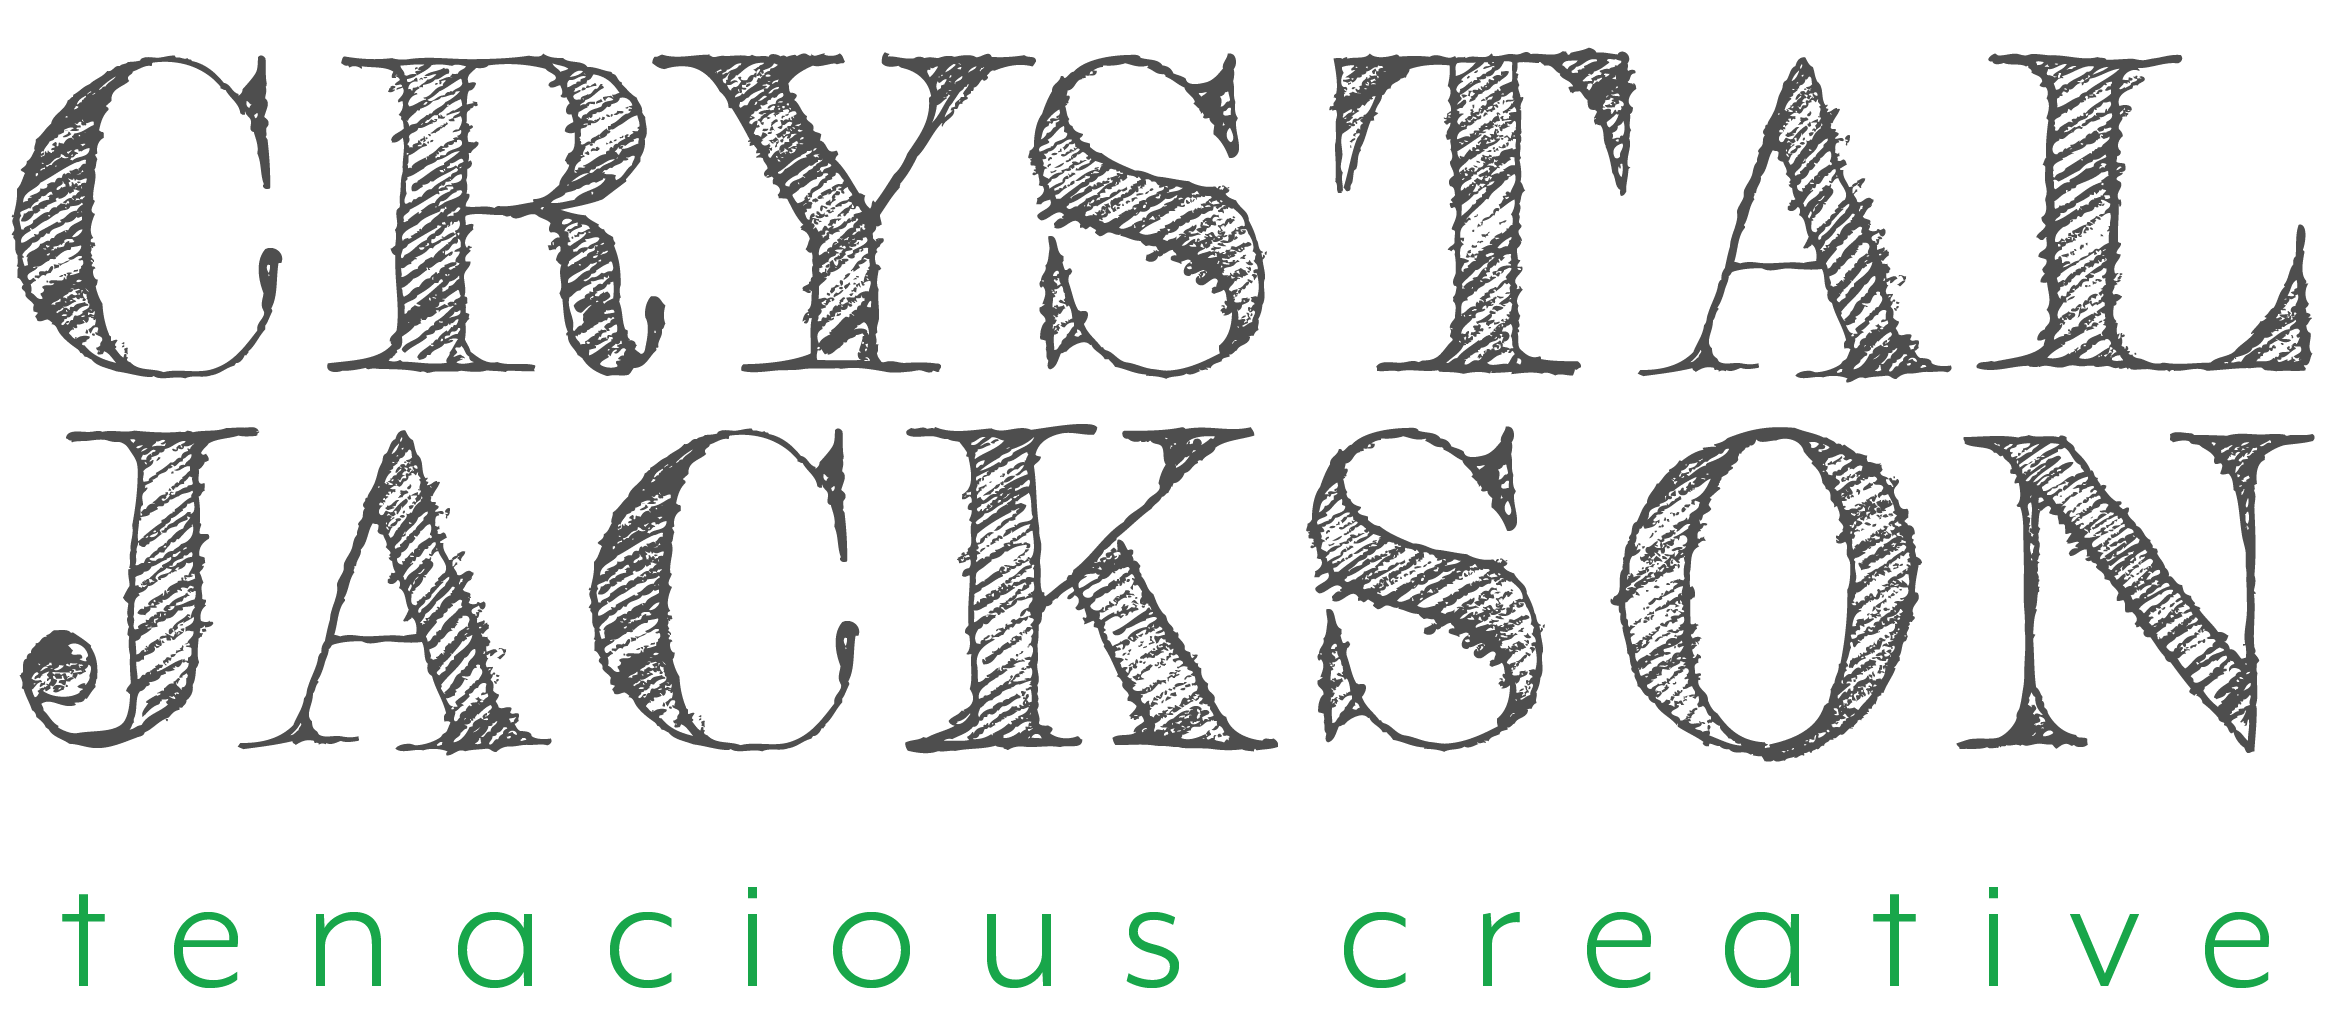 Crystal Jackson, tenacious creative